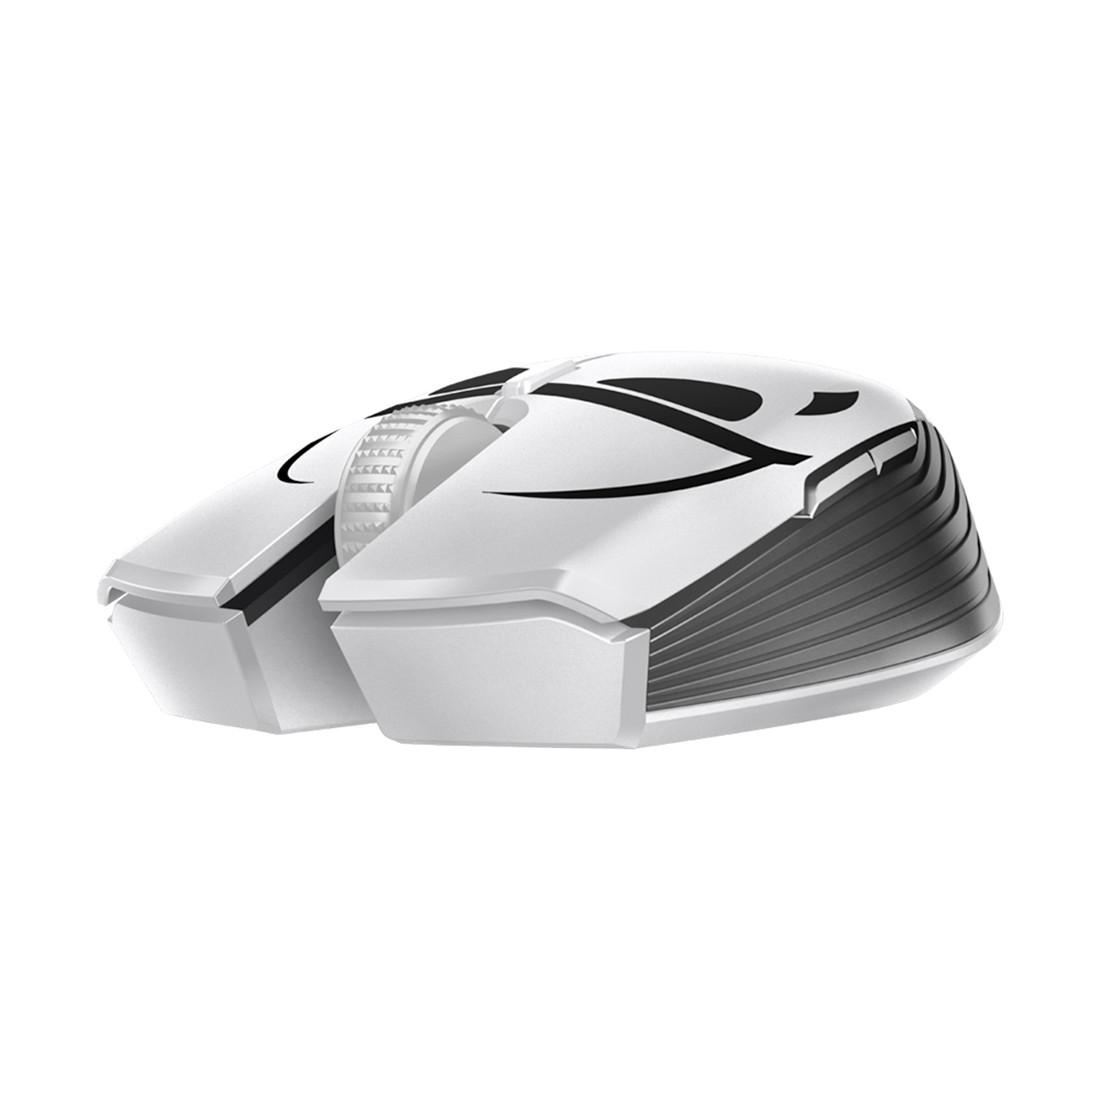 Компьютерная мышь Razer Atheris - Stormtrooper Ed.